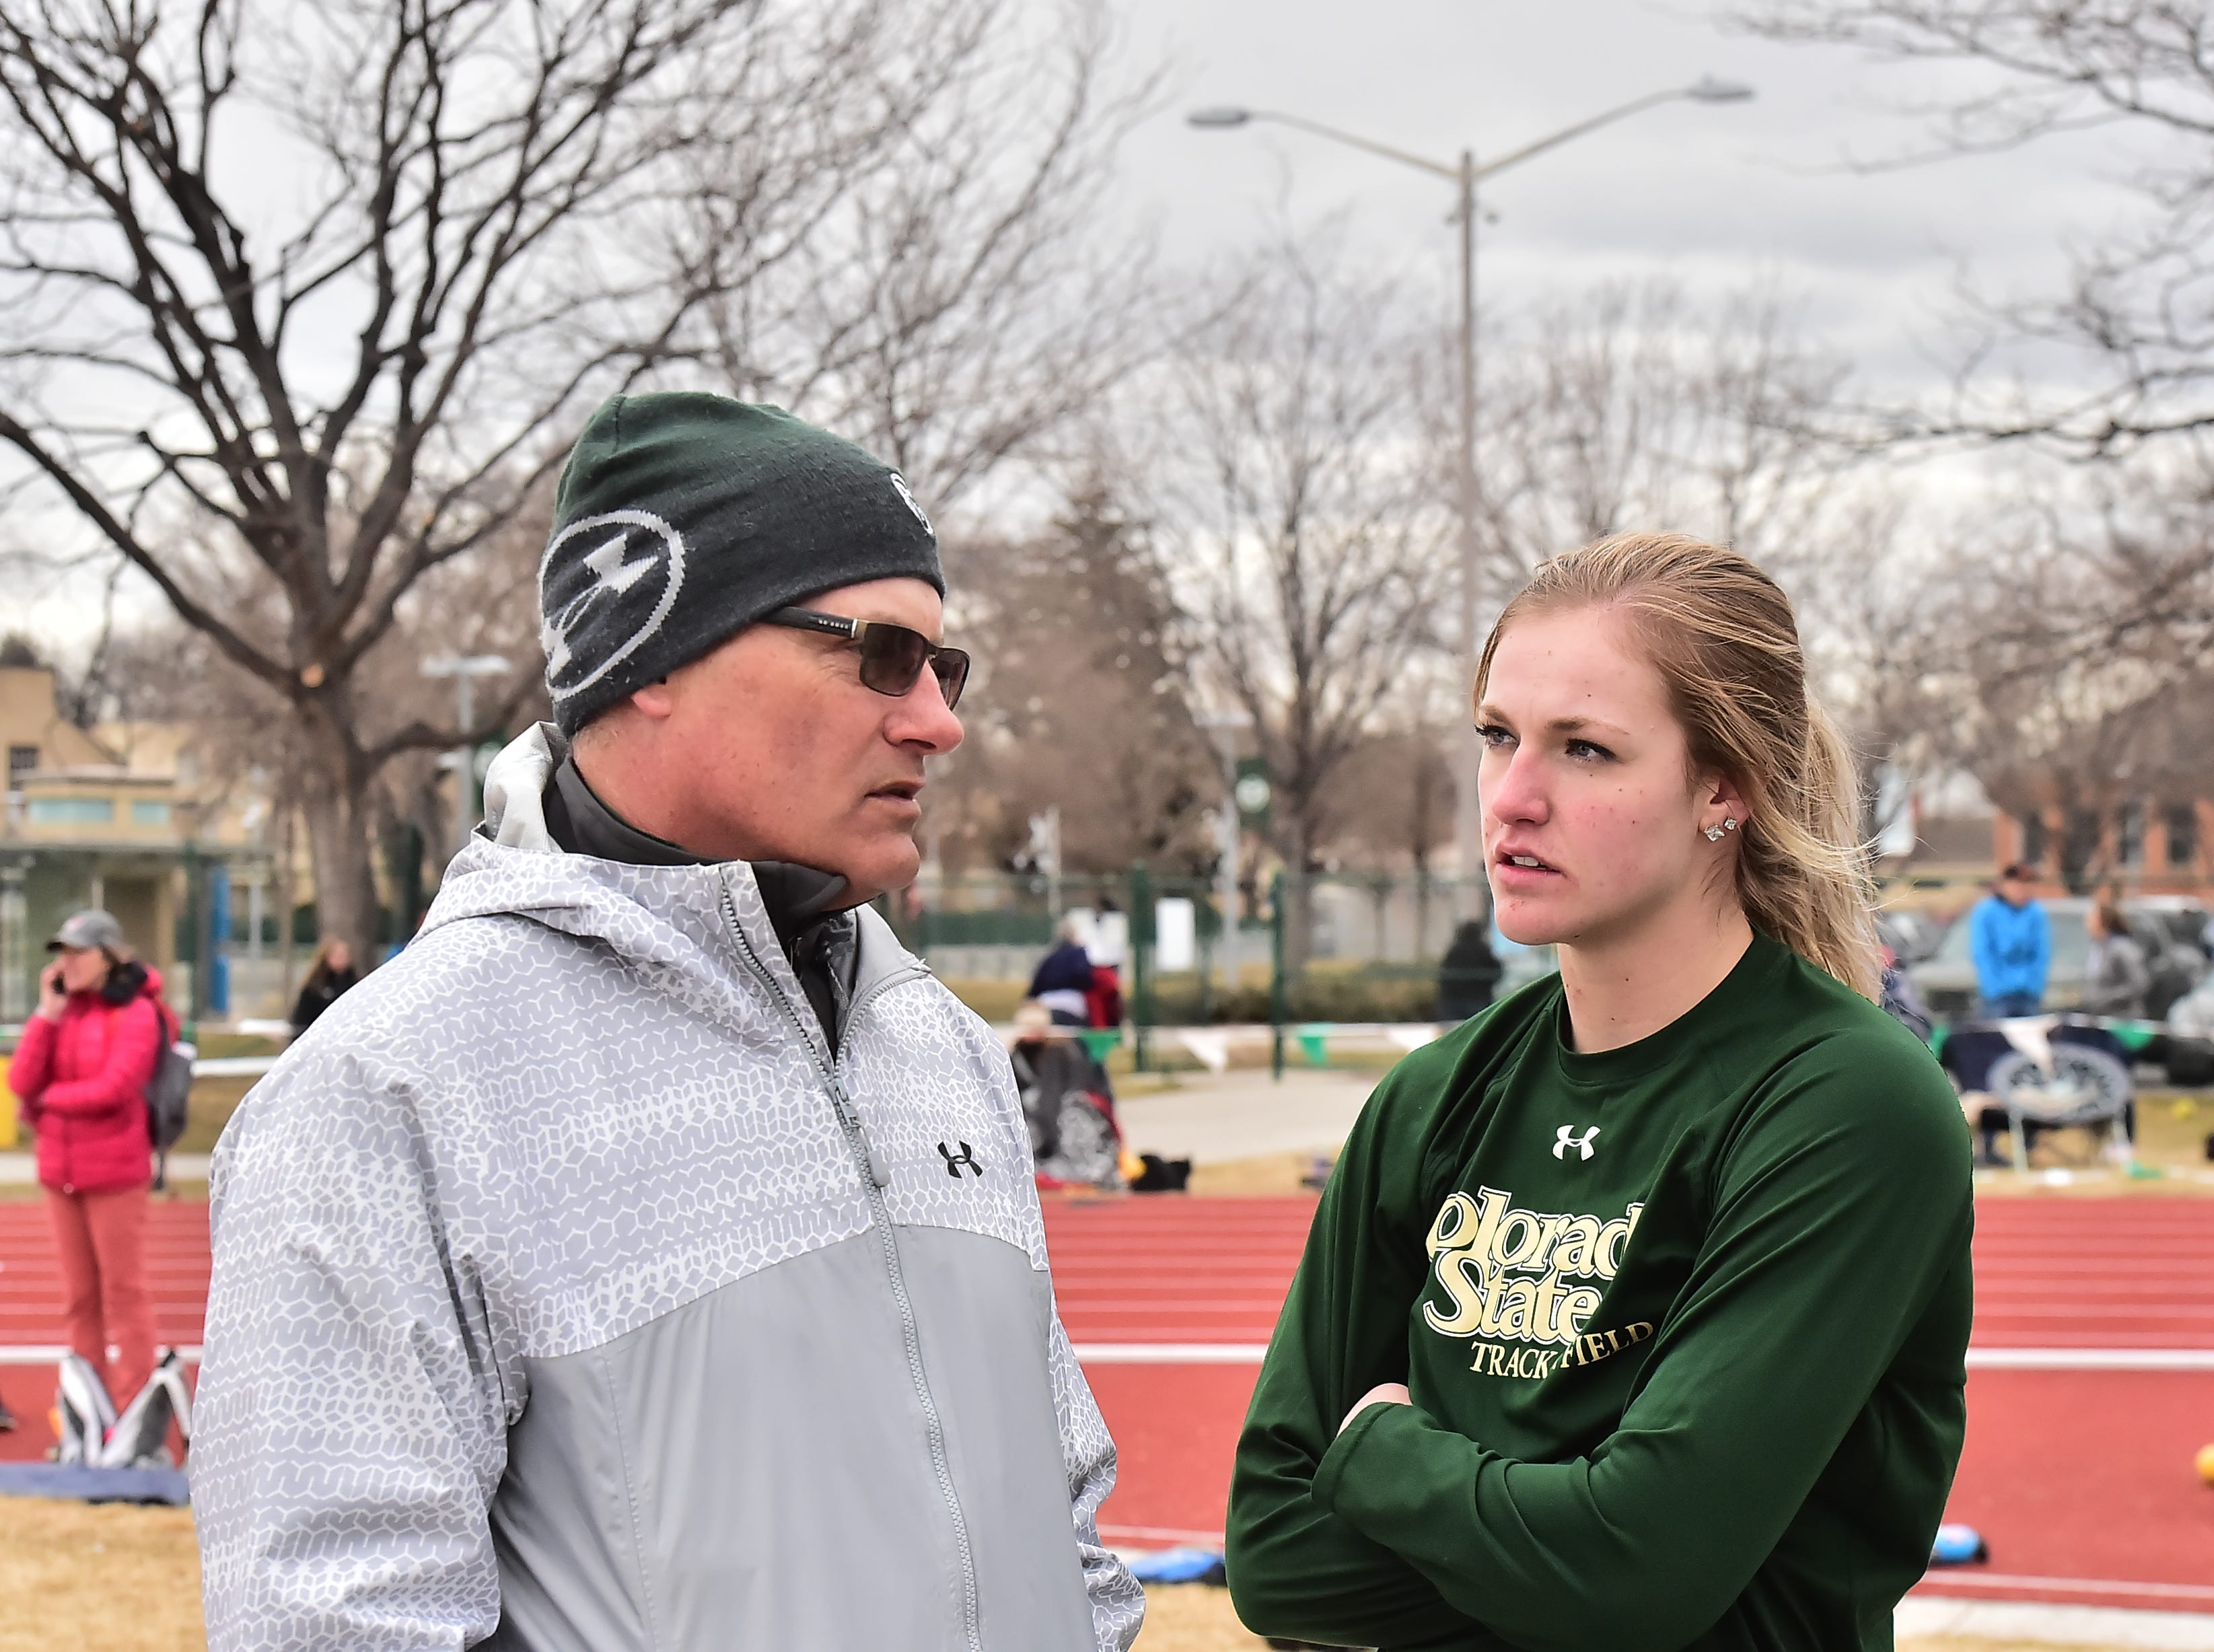 CSU coach Brian Bedard talks to women's shot put winner Tarynn Sieg during the Fum McGraw Open on Saturday, March 23, at Colorado State University's Jack Christiansen Track.